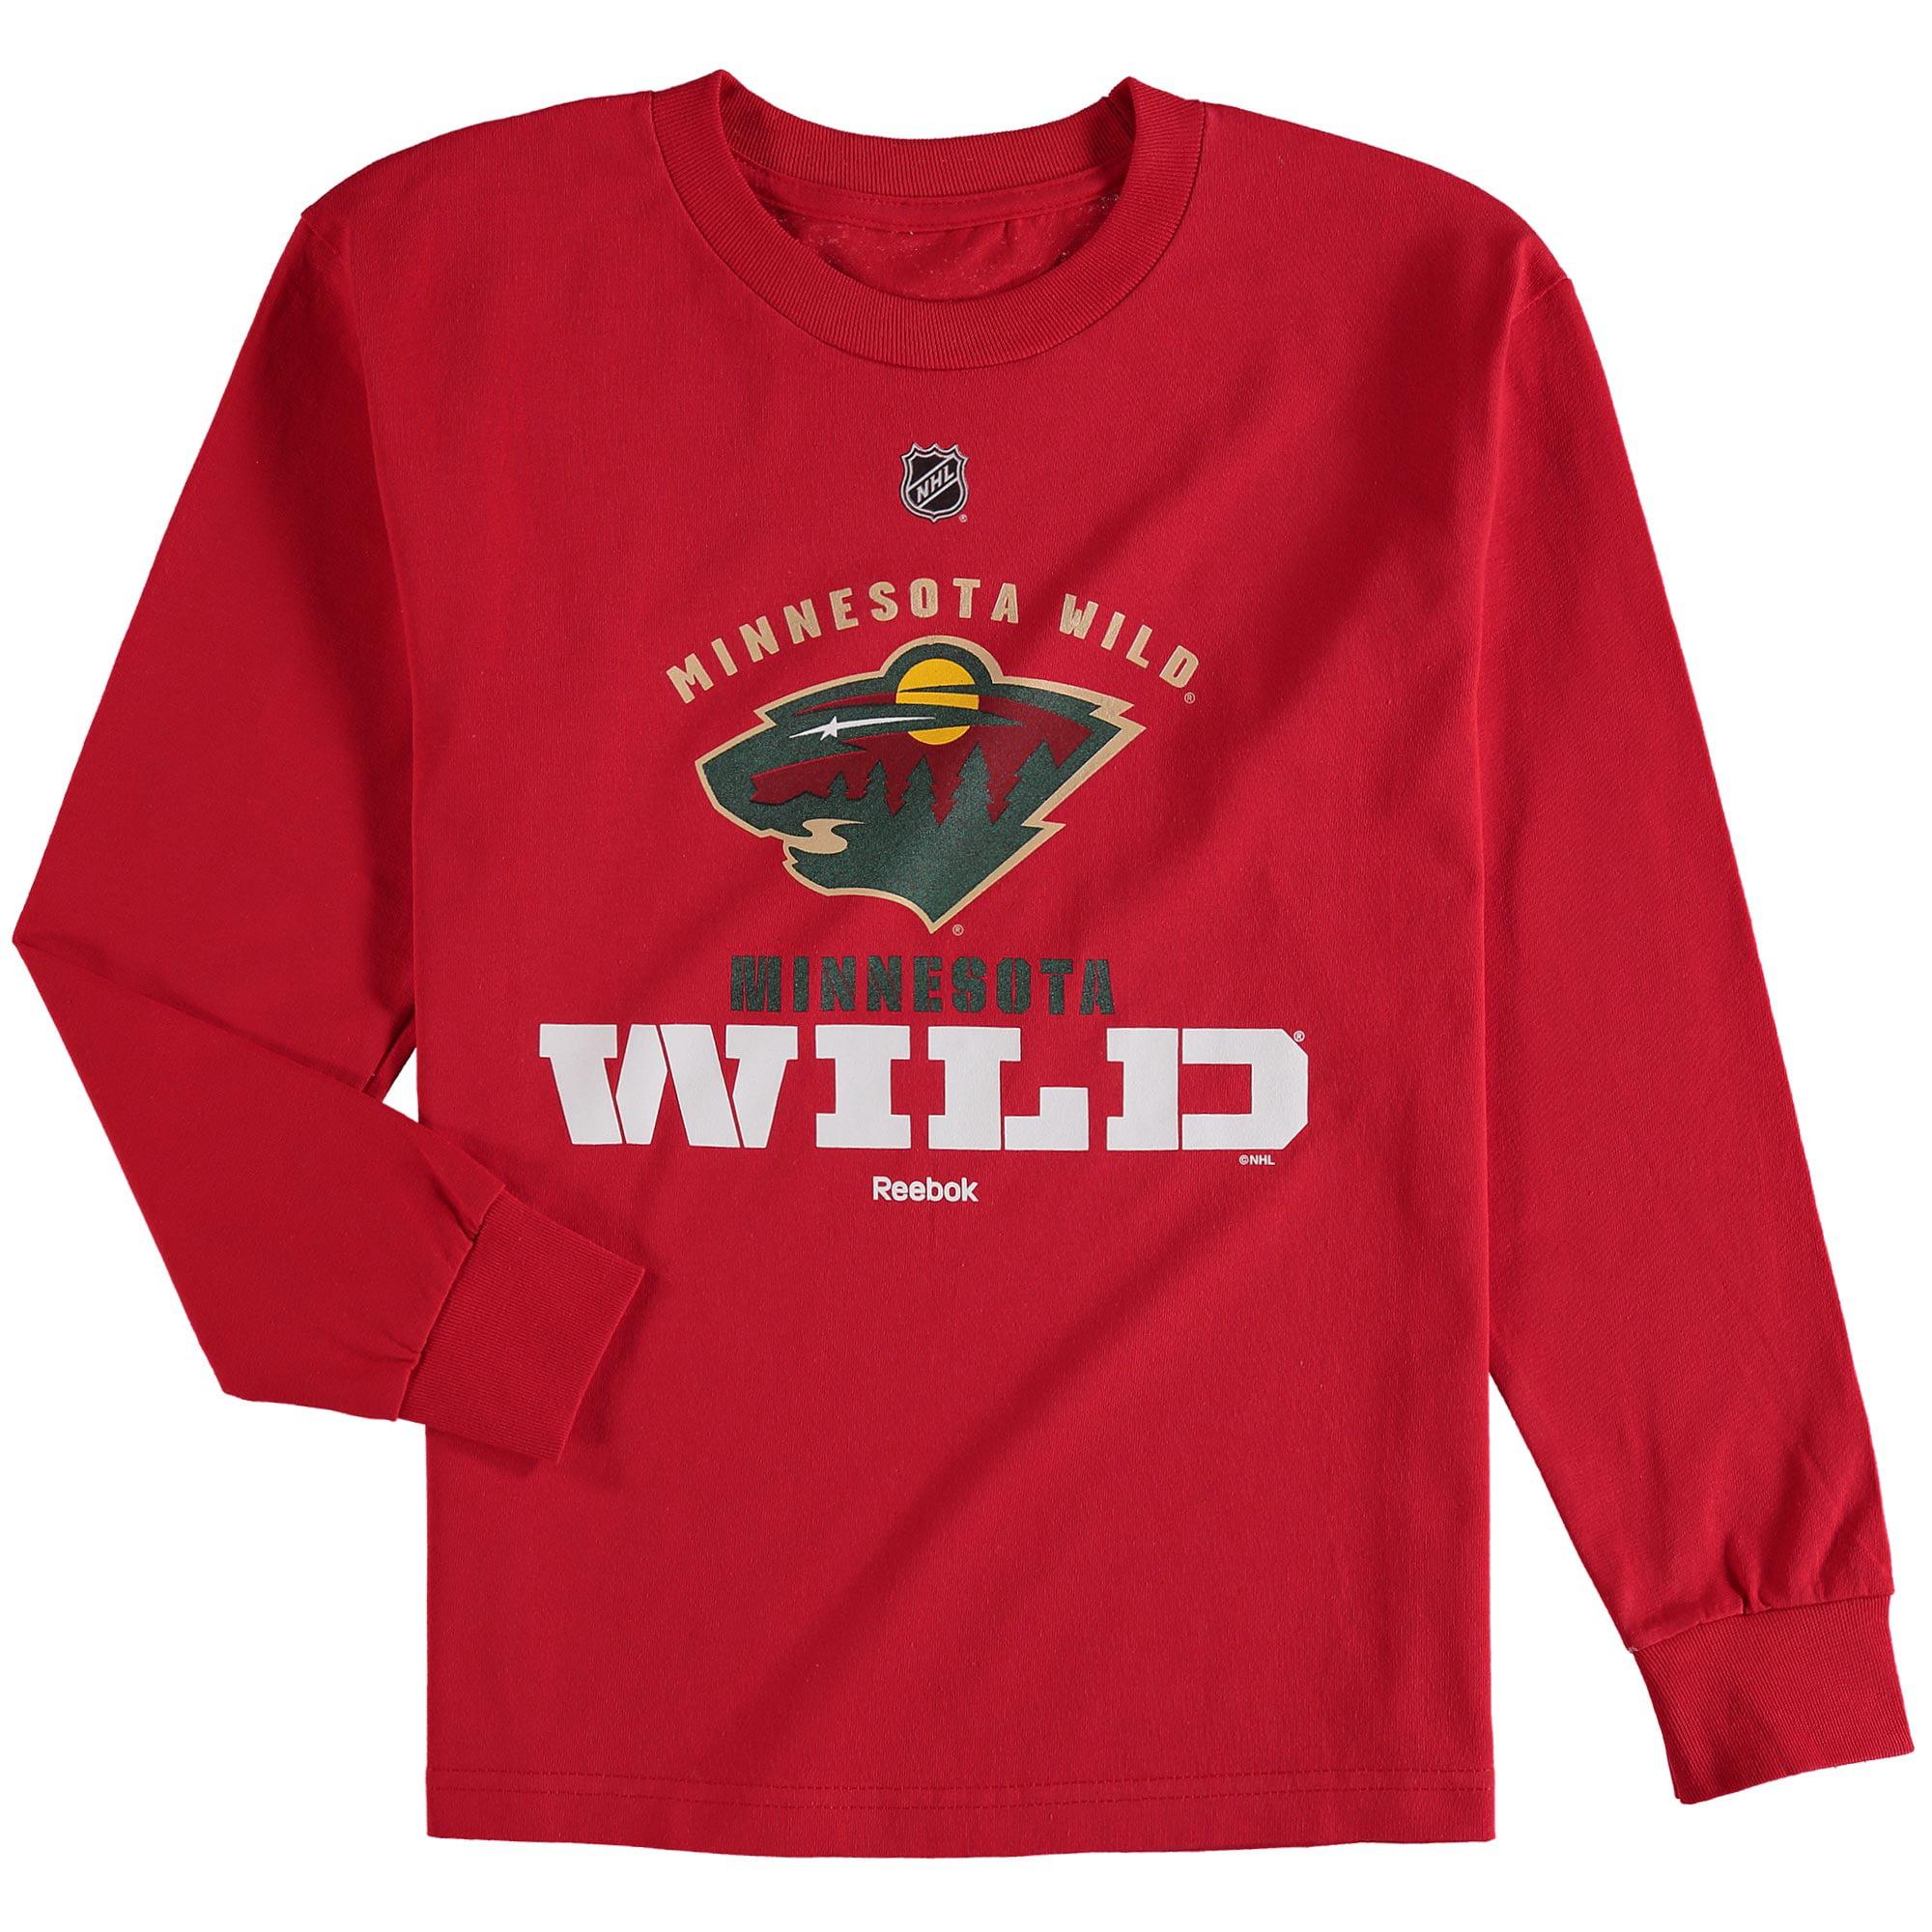 Minnesota Wild Reebok Youth Clean Cut Long Sleeve T-Shirt - Red